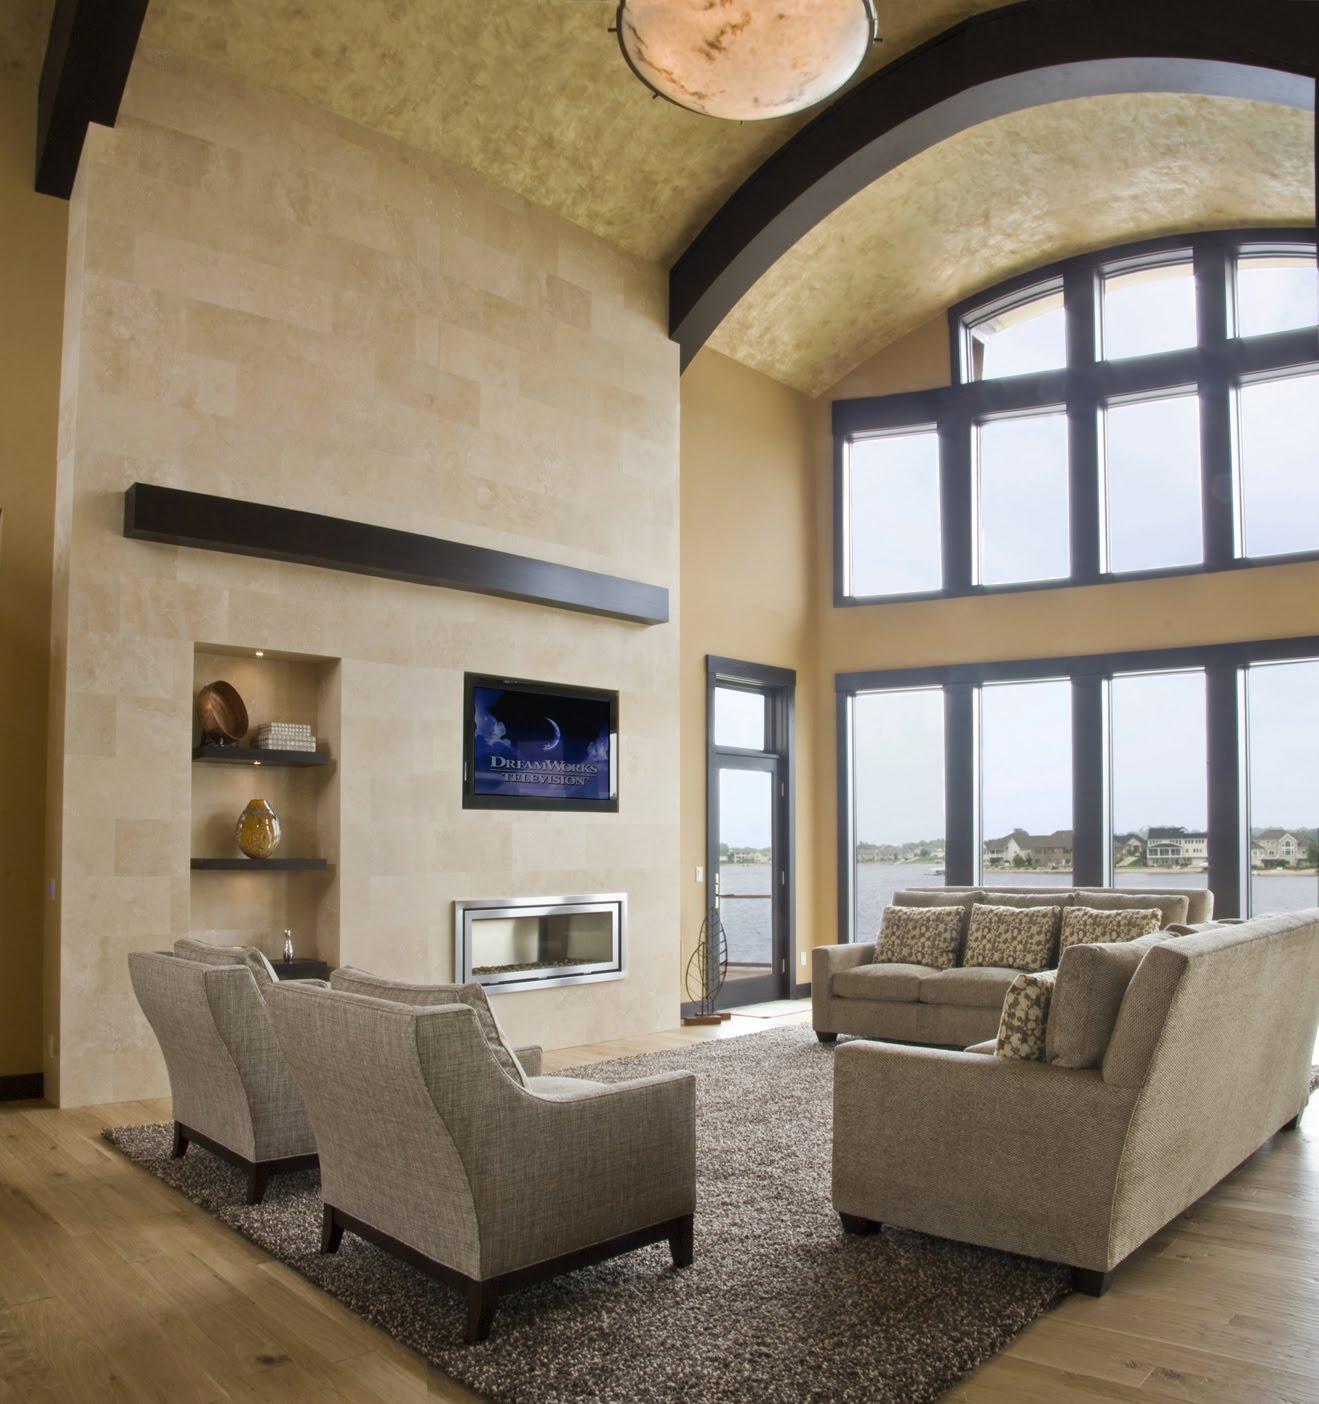 Best interior design house for Multi color living room ideas